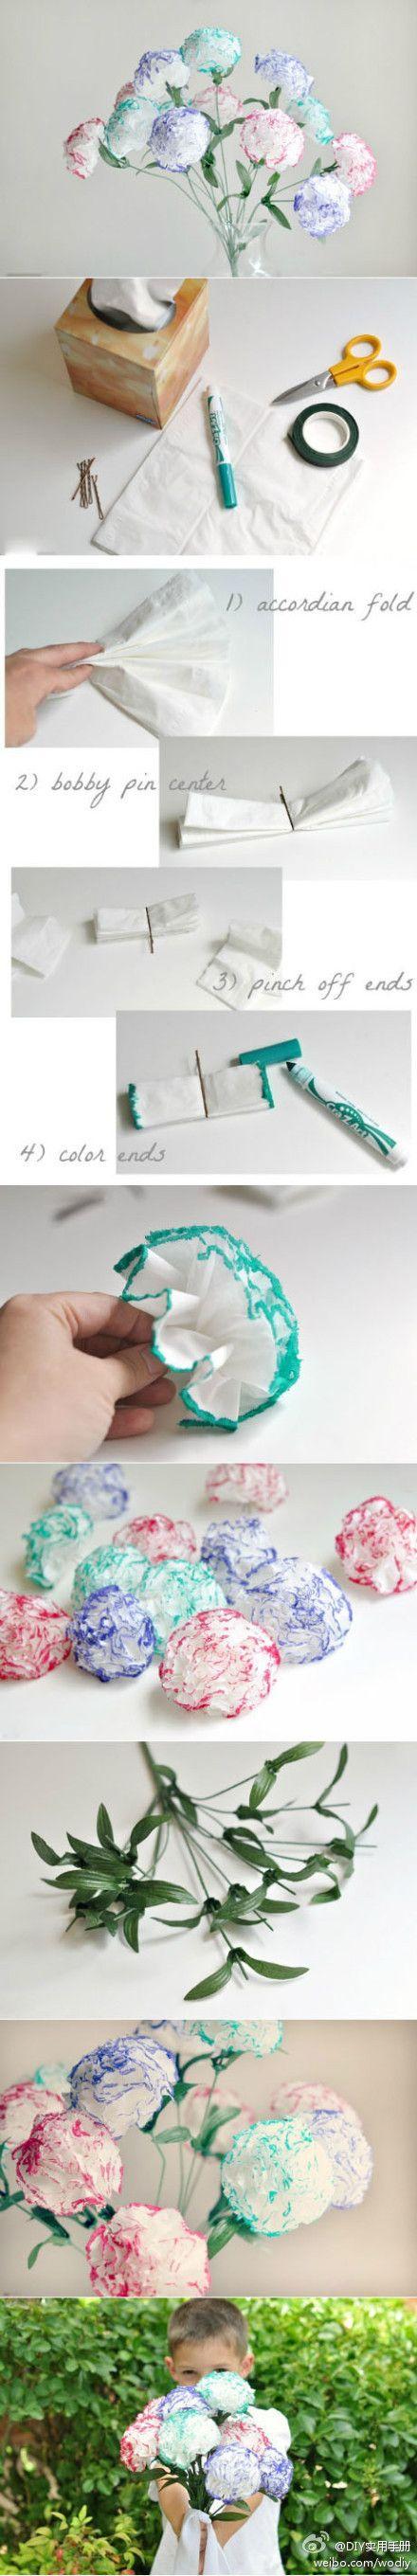 PAP - Cravos com papel de seda.